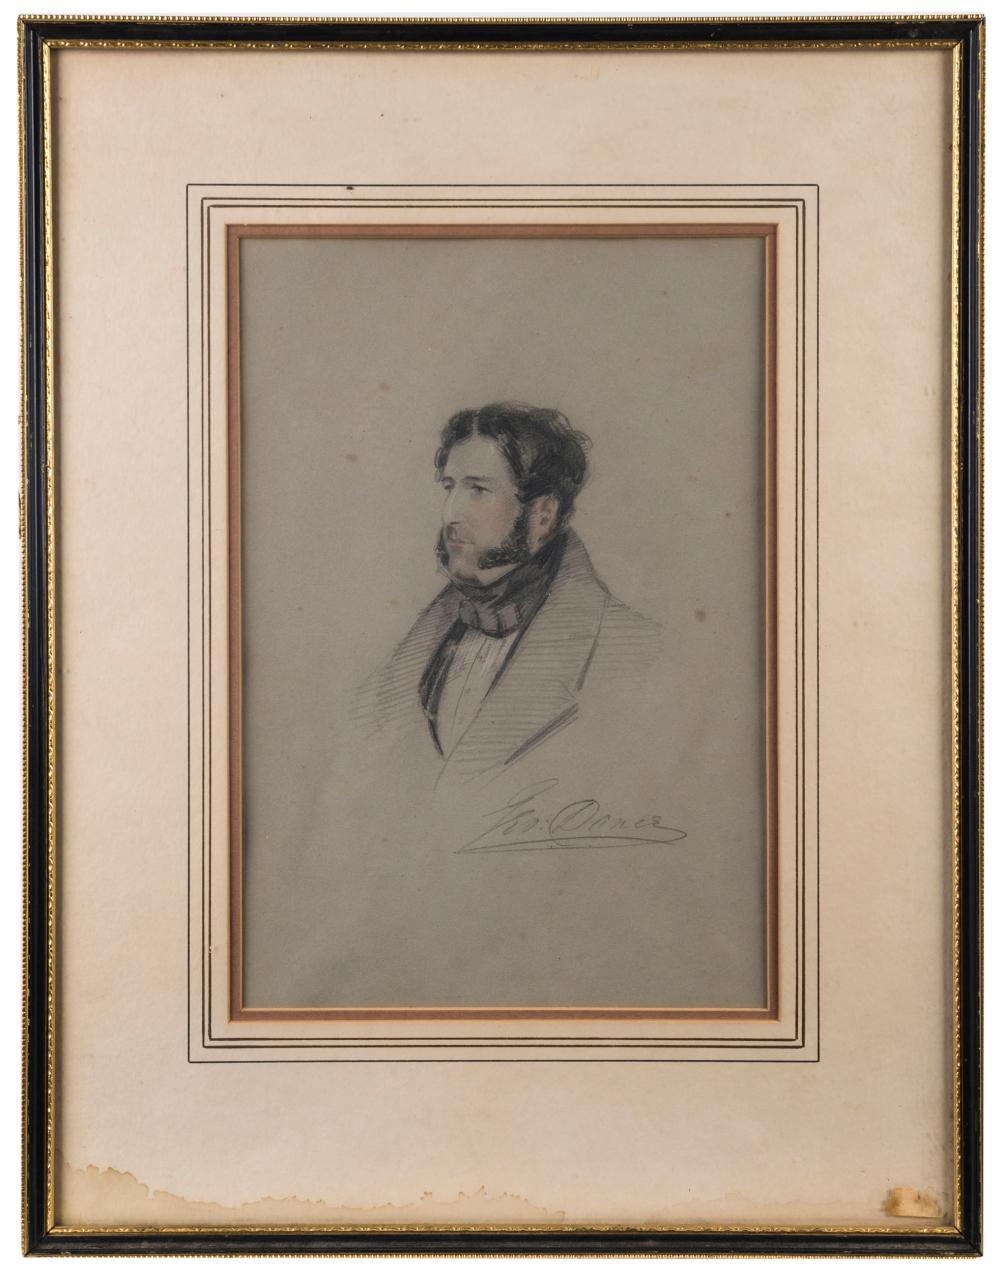 "GEORGE DANCE, (British, 19th century), portrait of a gentleman, pastel on paper, signed lower right ""Geo. Dance"", 32 x 23cm"